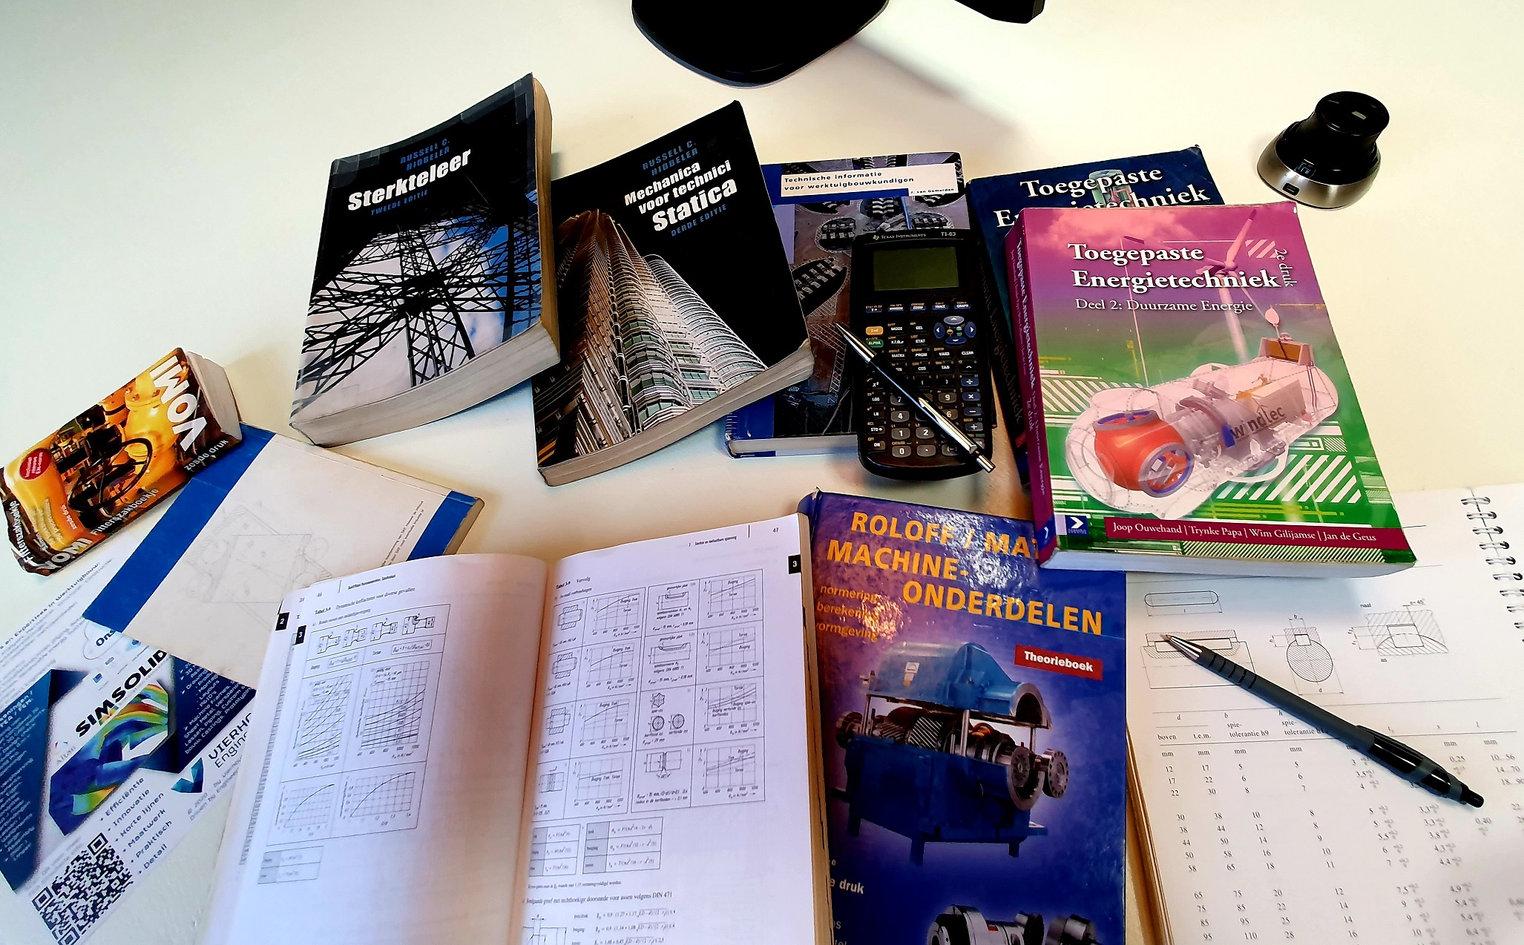 WTB-Mechanical-Vierhout Engineering-divers-001